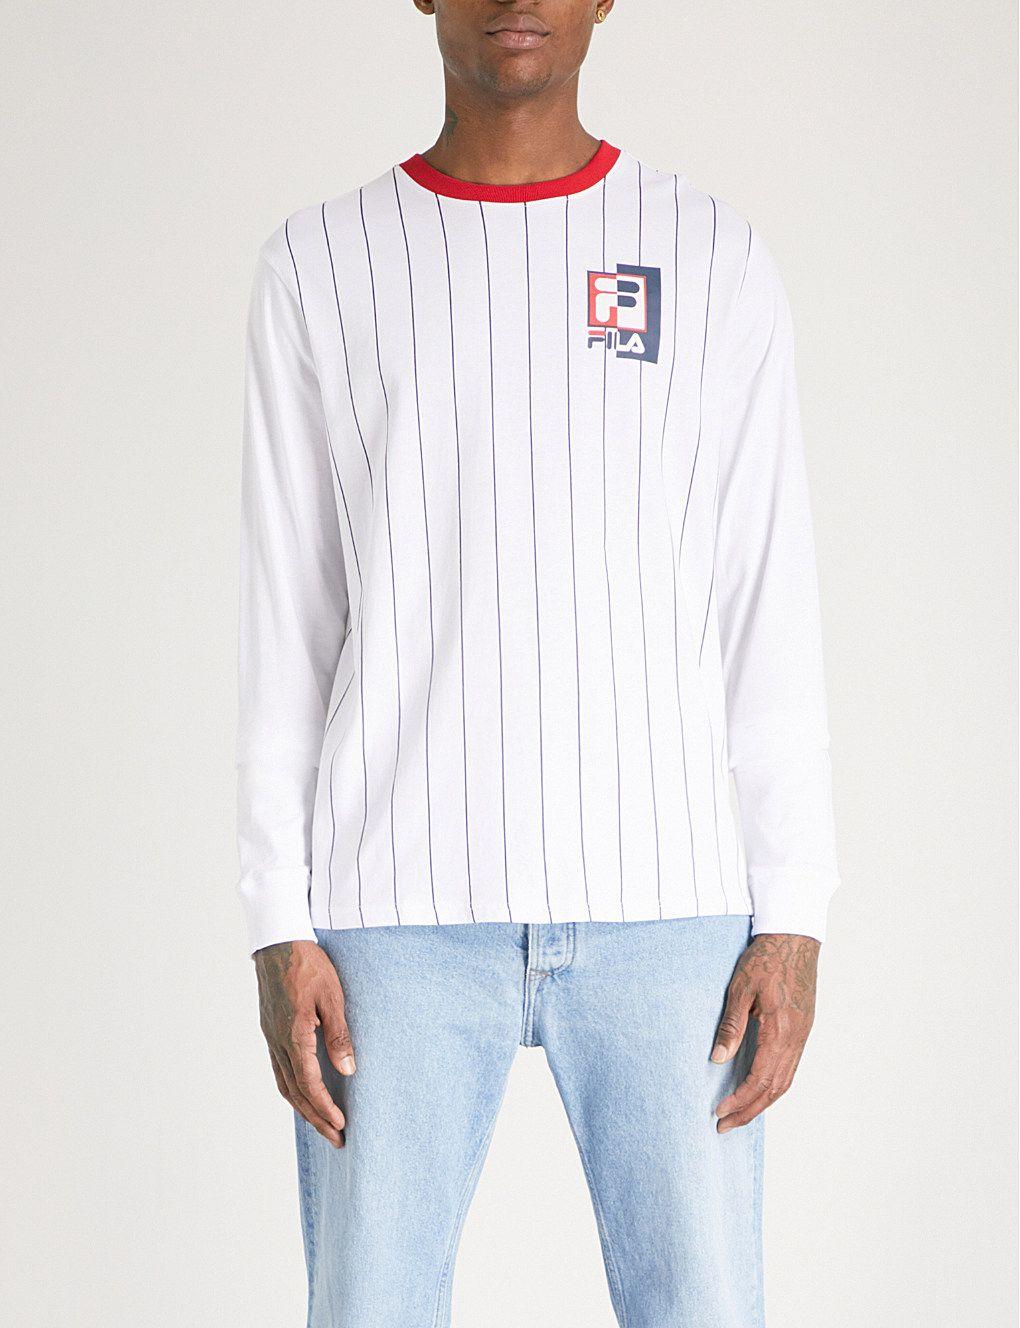 51bdbb9e2446 FILA Striped cotton-jersey top | Trend: Baseball | Mens printed ...